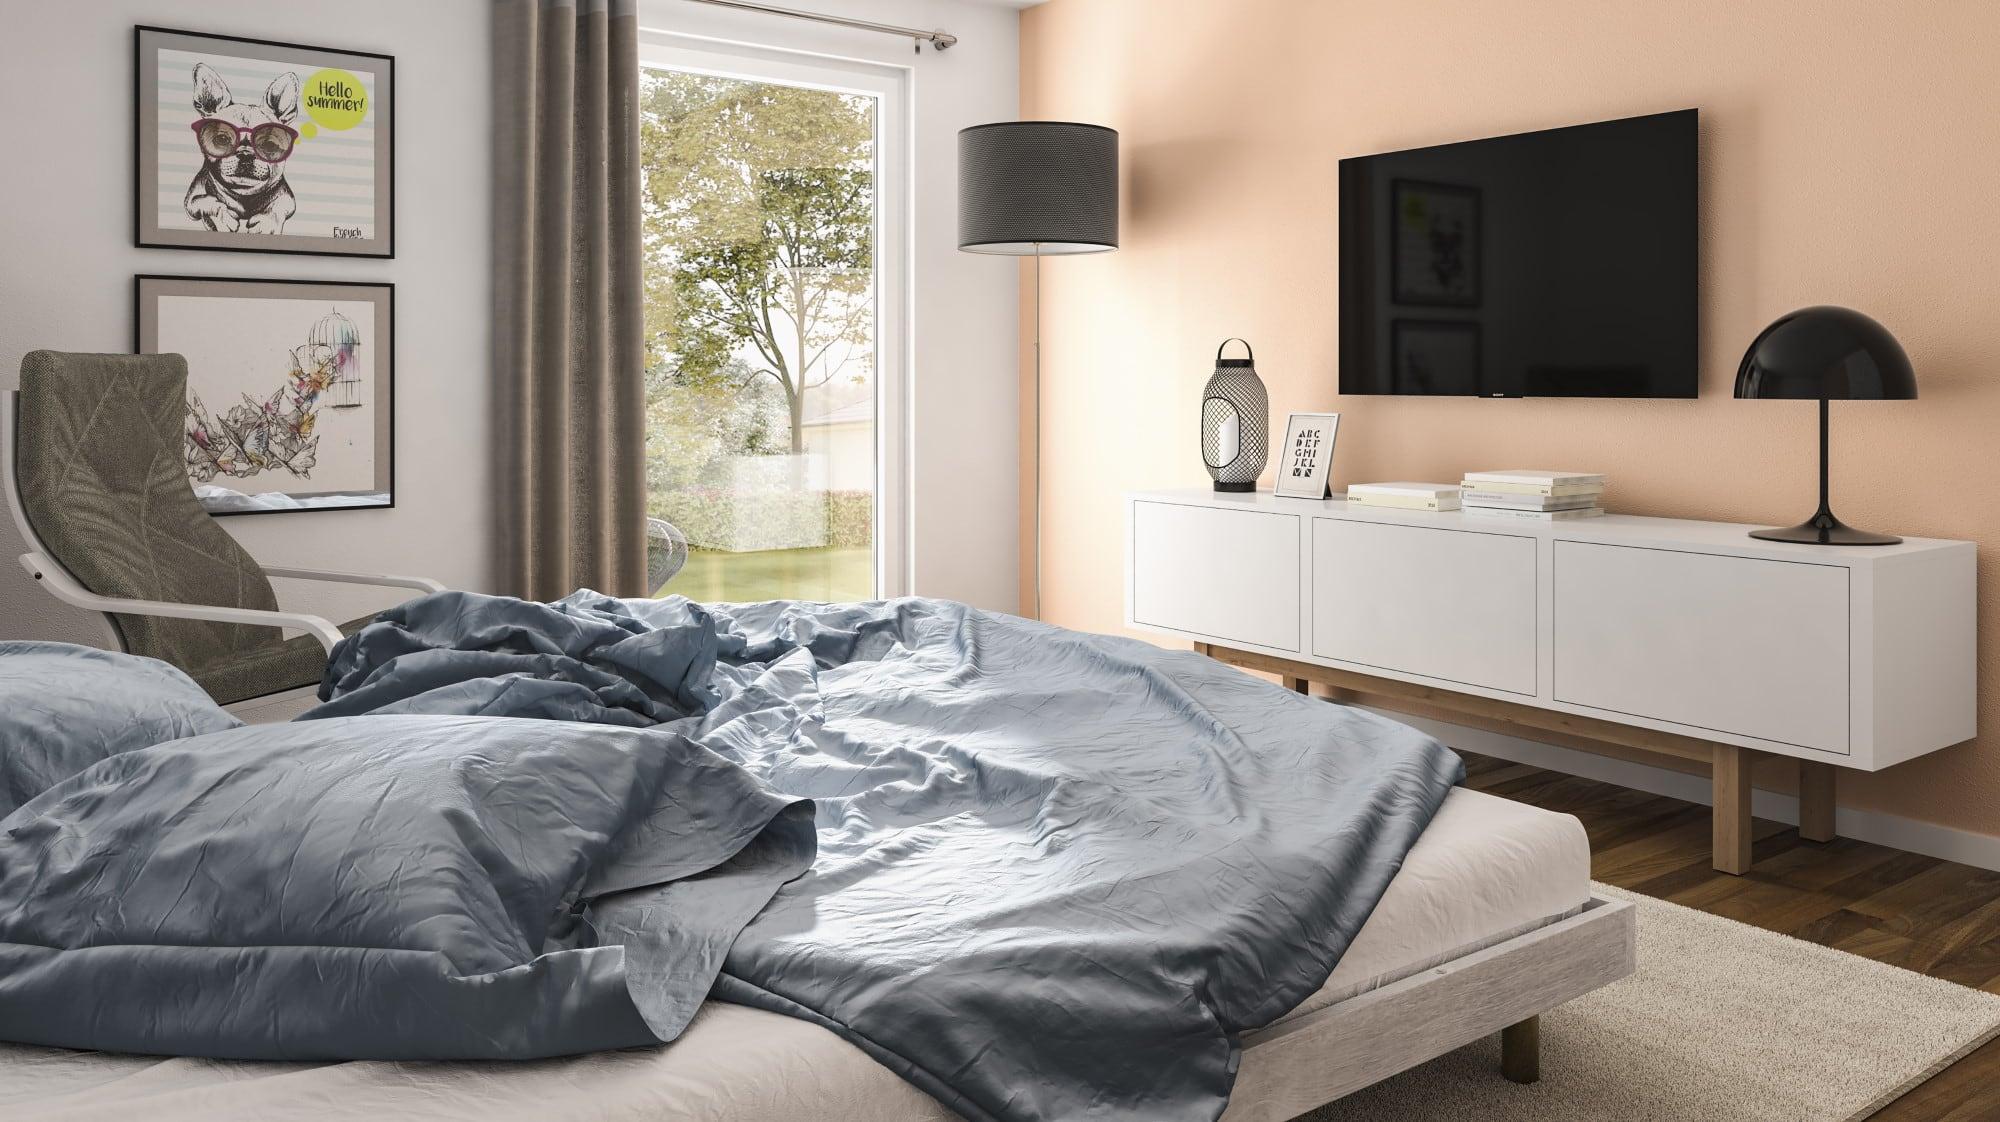 Schlafzimmer mit TV Wand - Haus Design Ideen innen Town Country Haus Bungalow 131 - HausbauDirekt.de